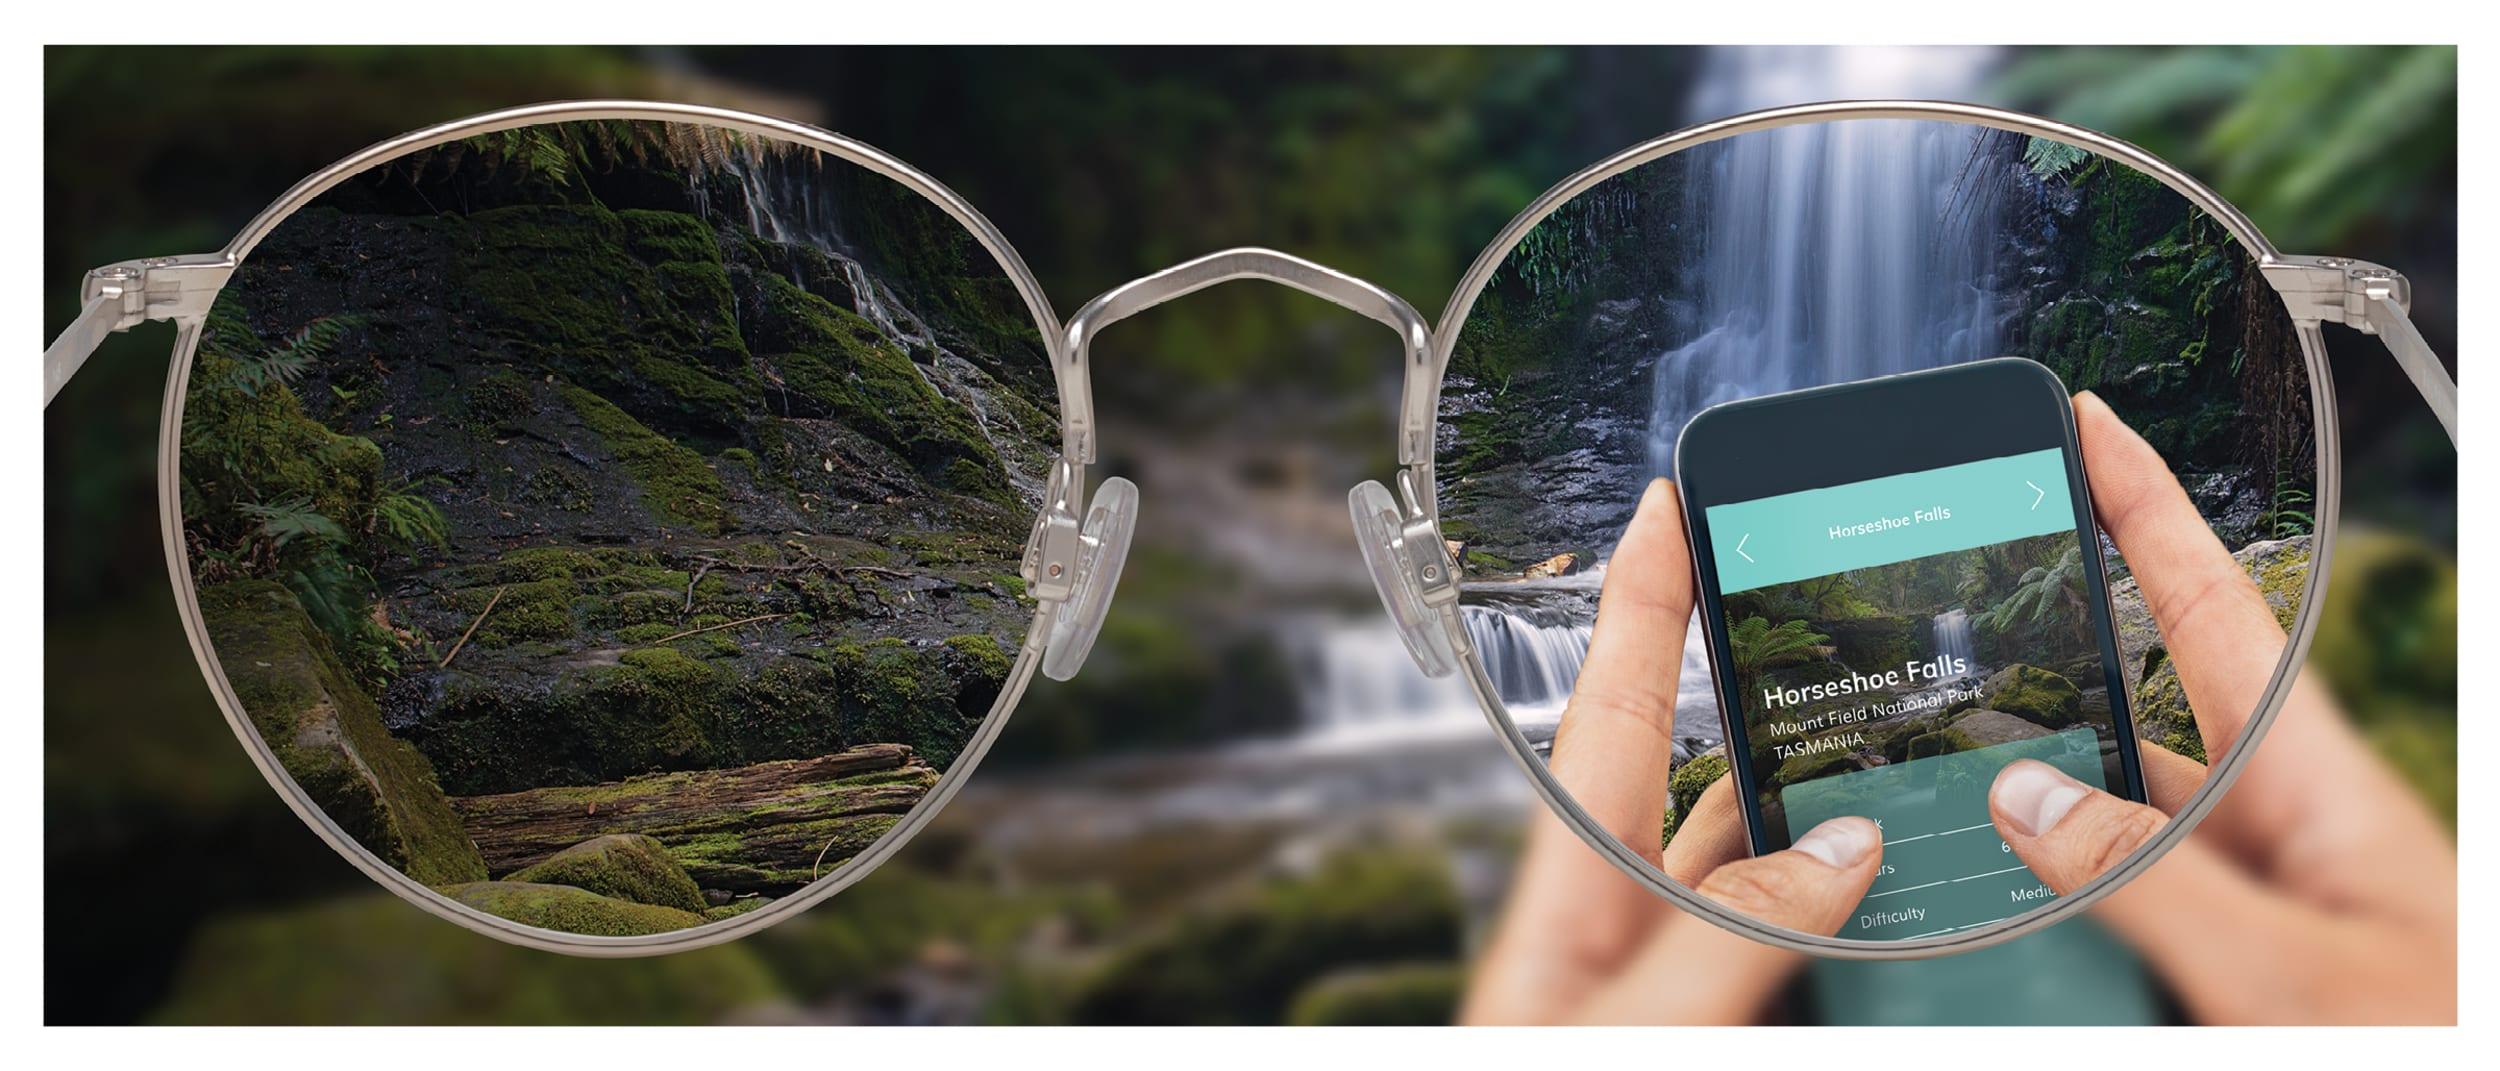 Laubman & Pank: $150 off digital multifocal lenses*